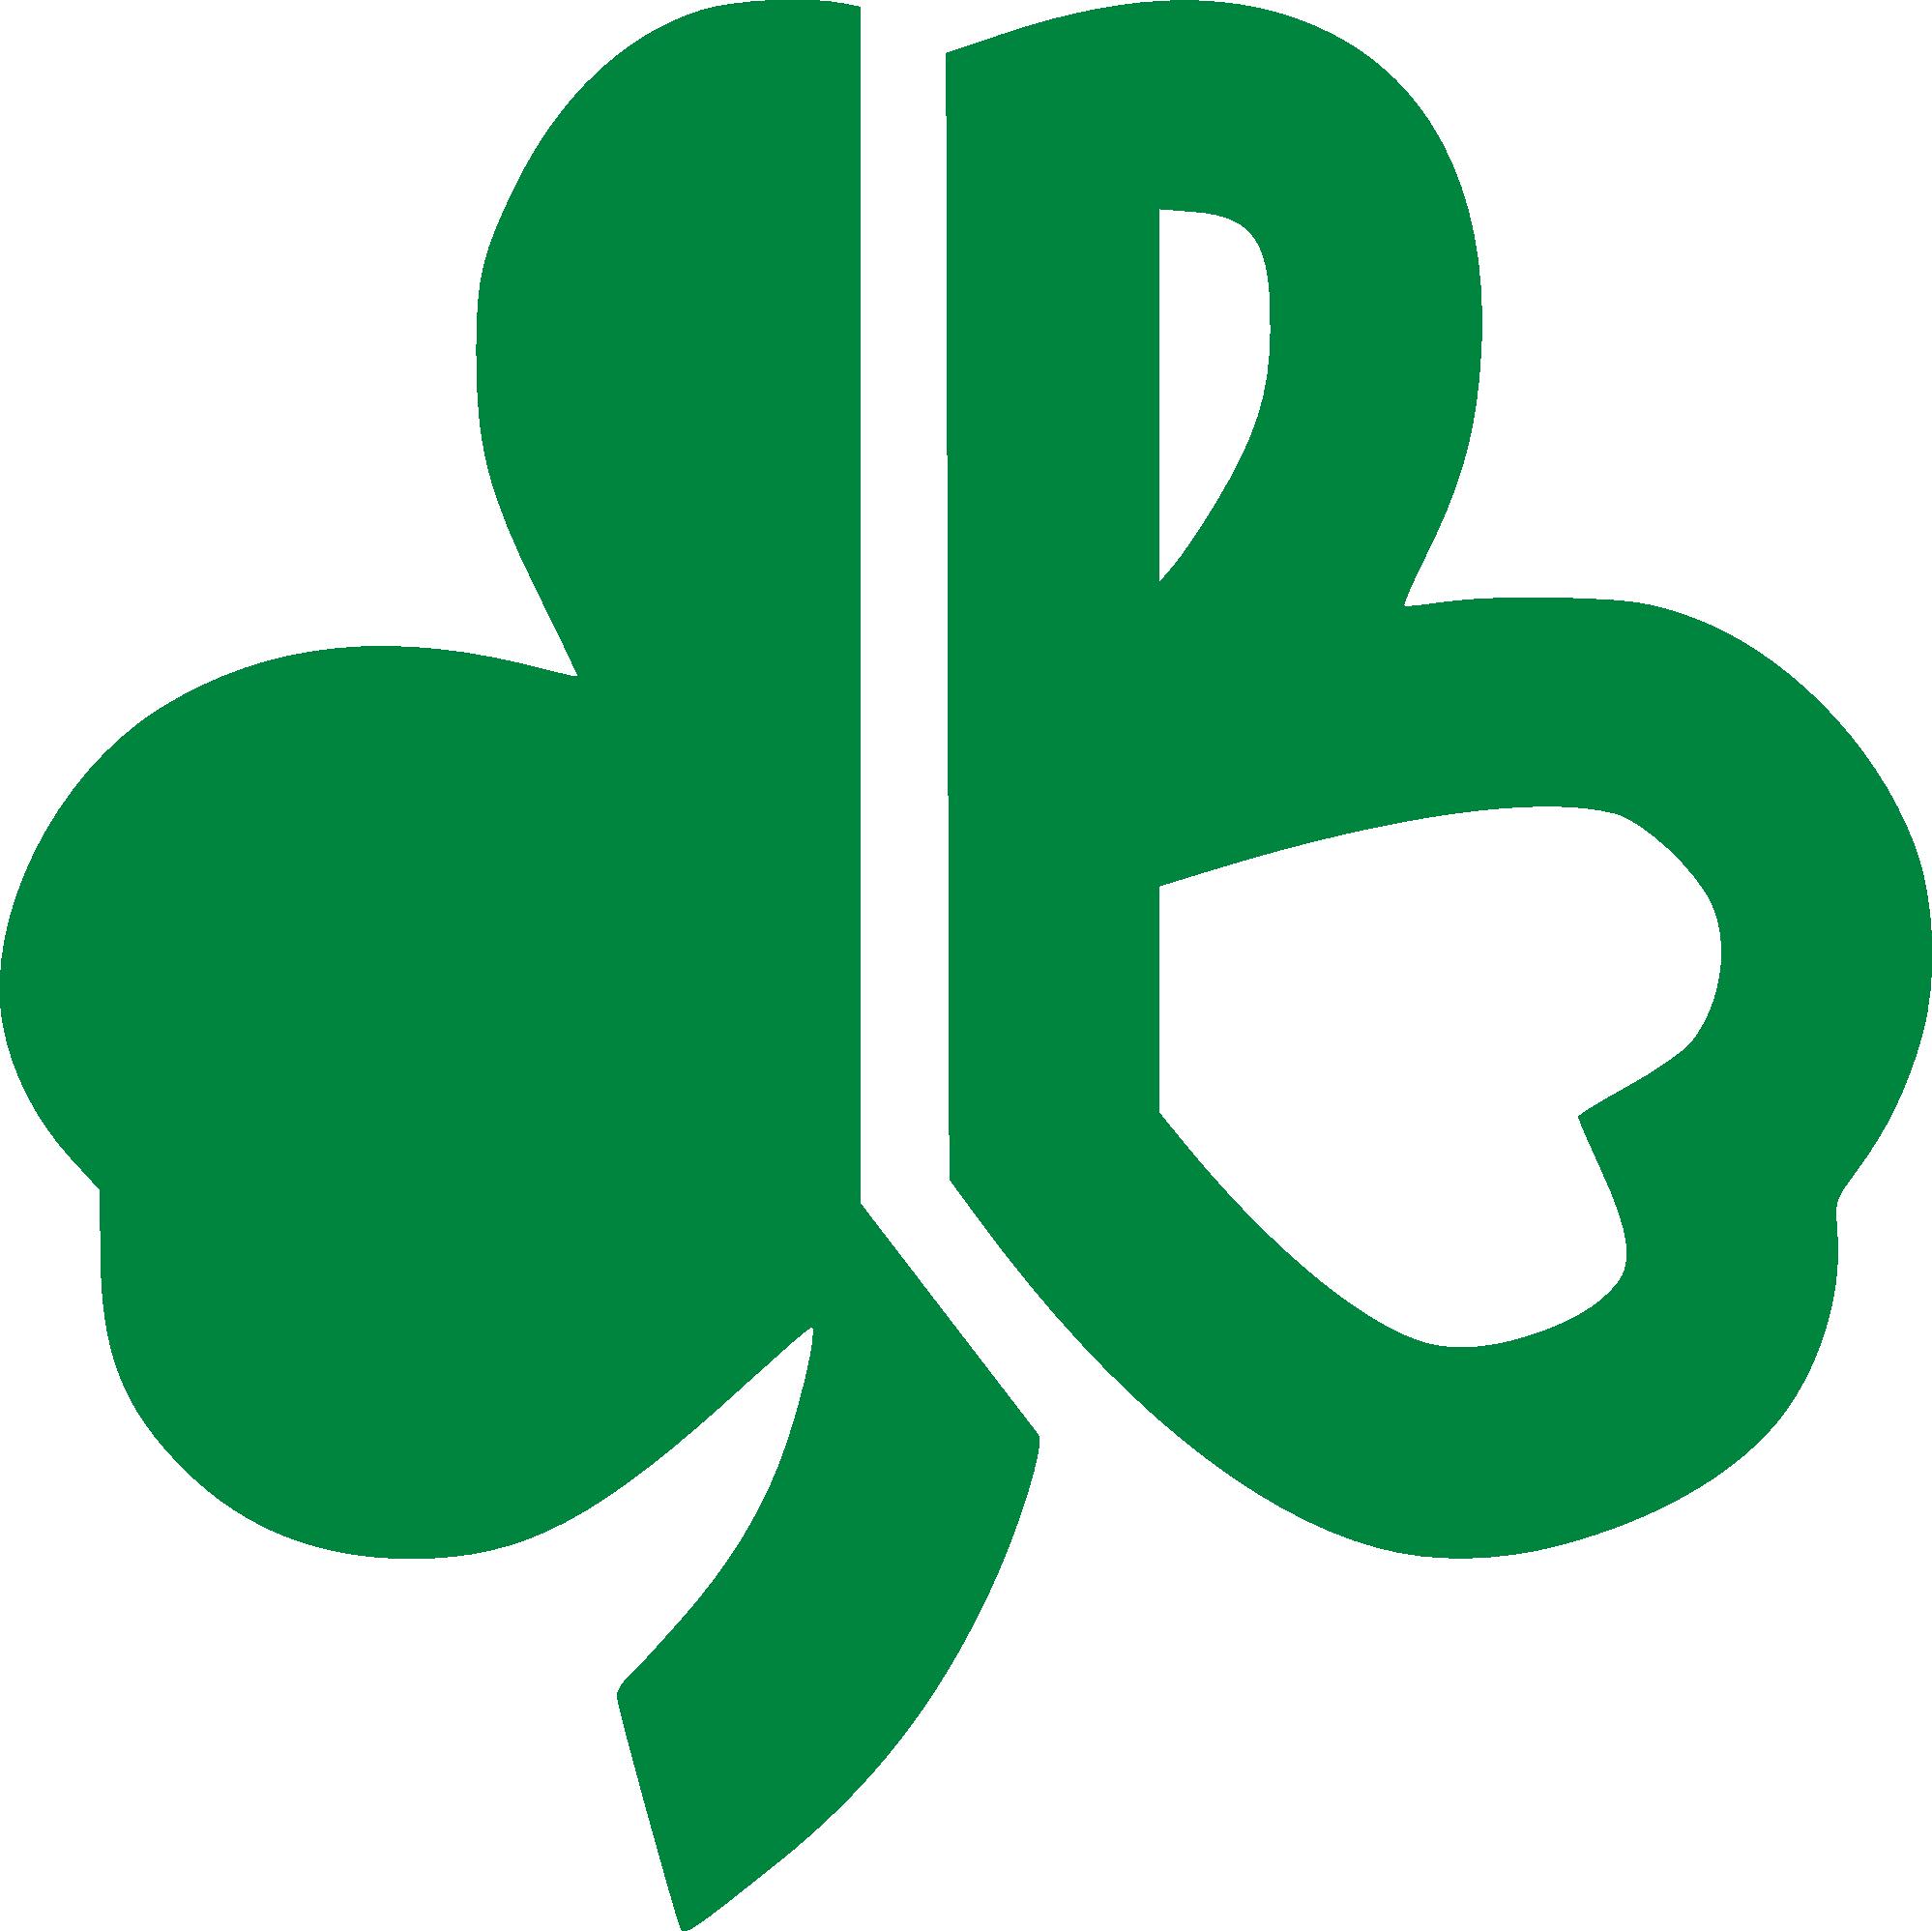 Boston celtics basketball clipart clip art free stock Vintage 1970's Boston Celtics clover shamrock capital B logo | 70's ... clip art free stock